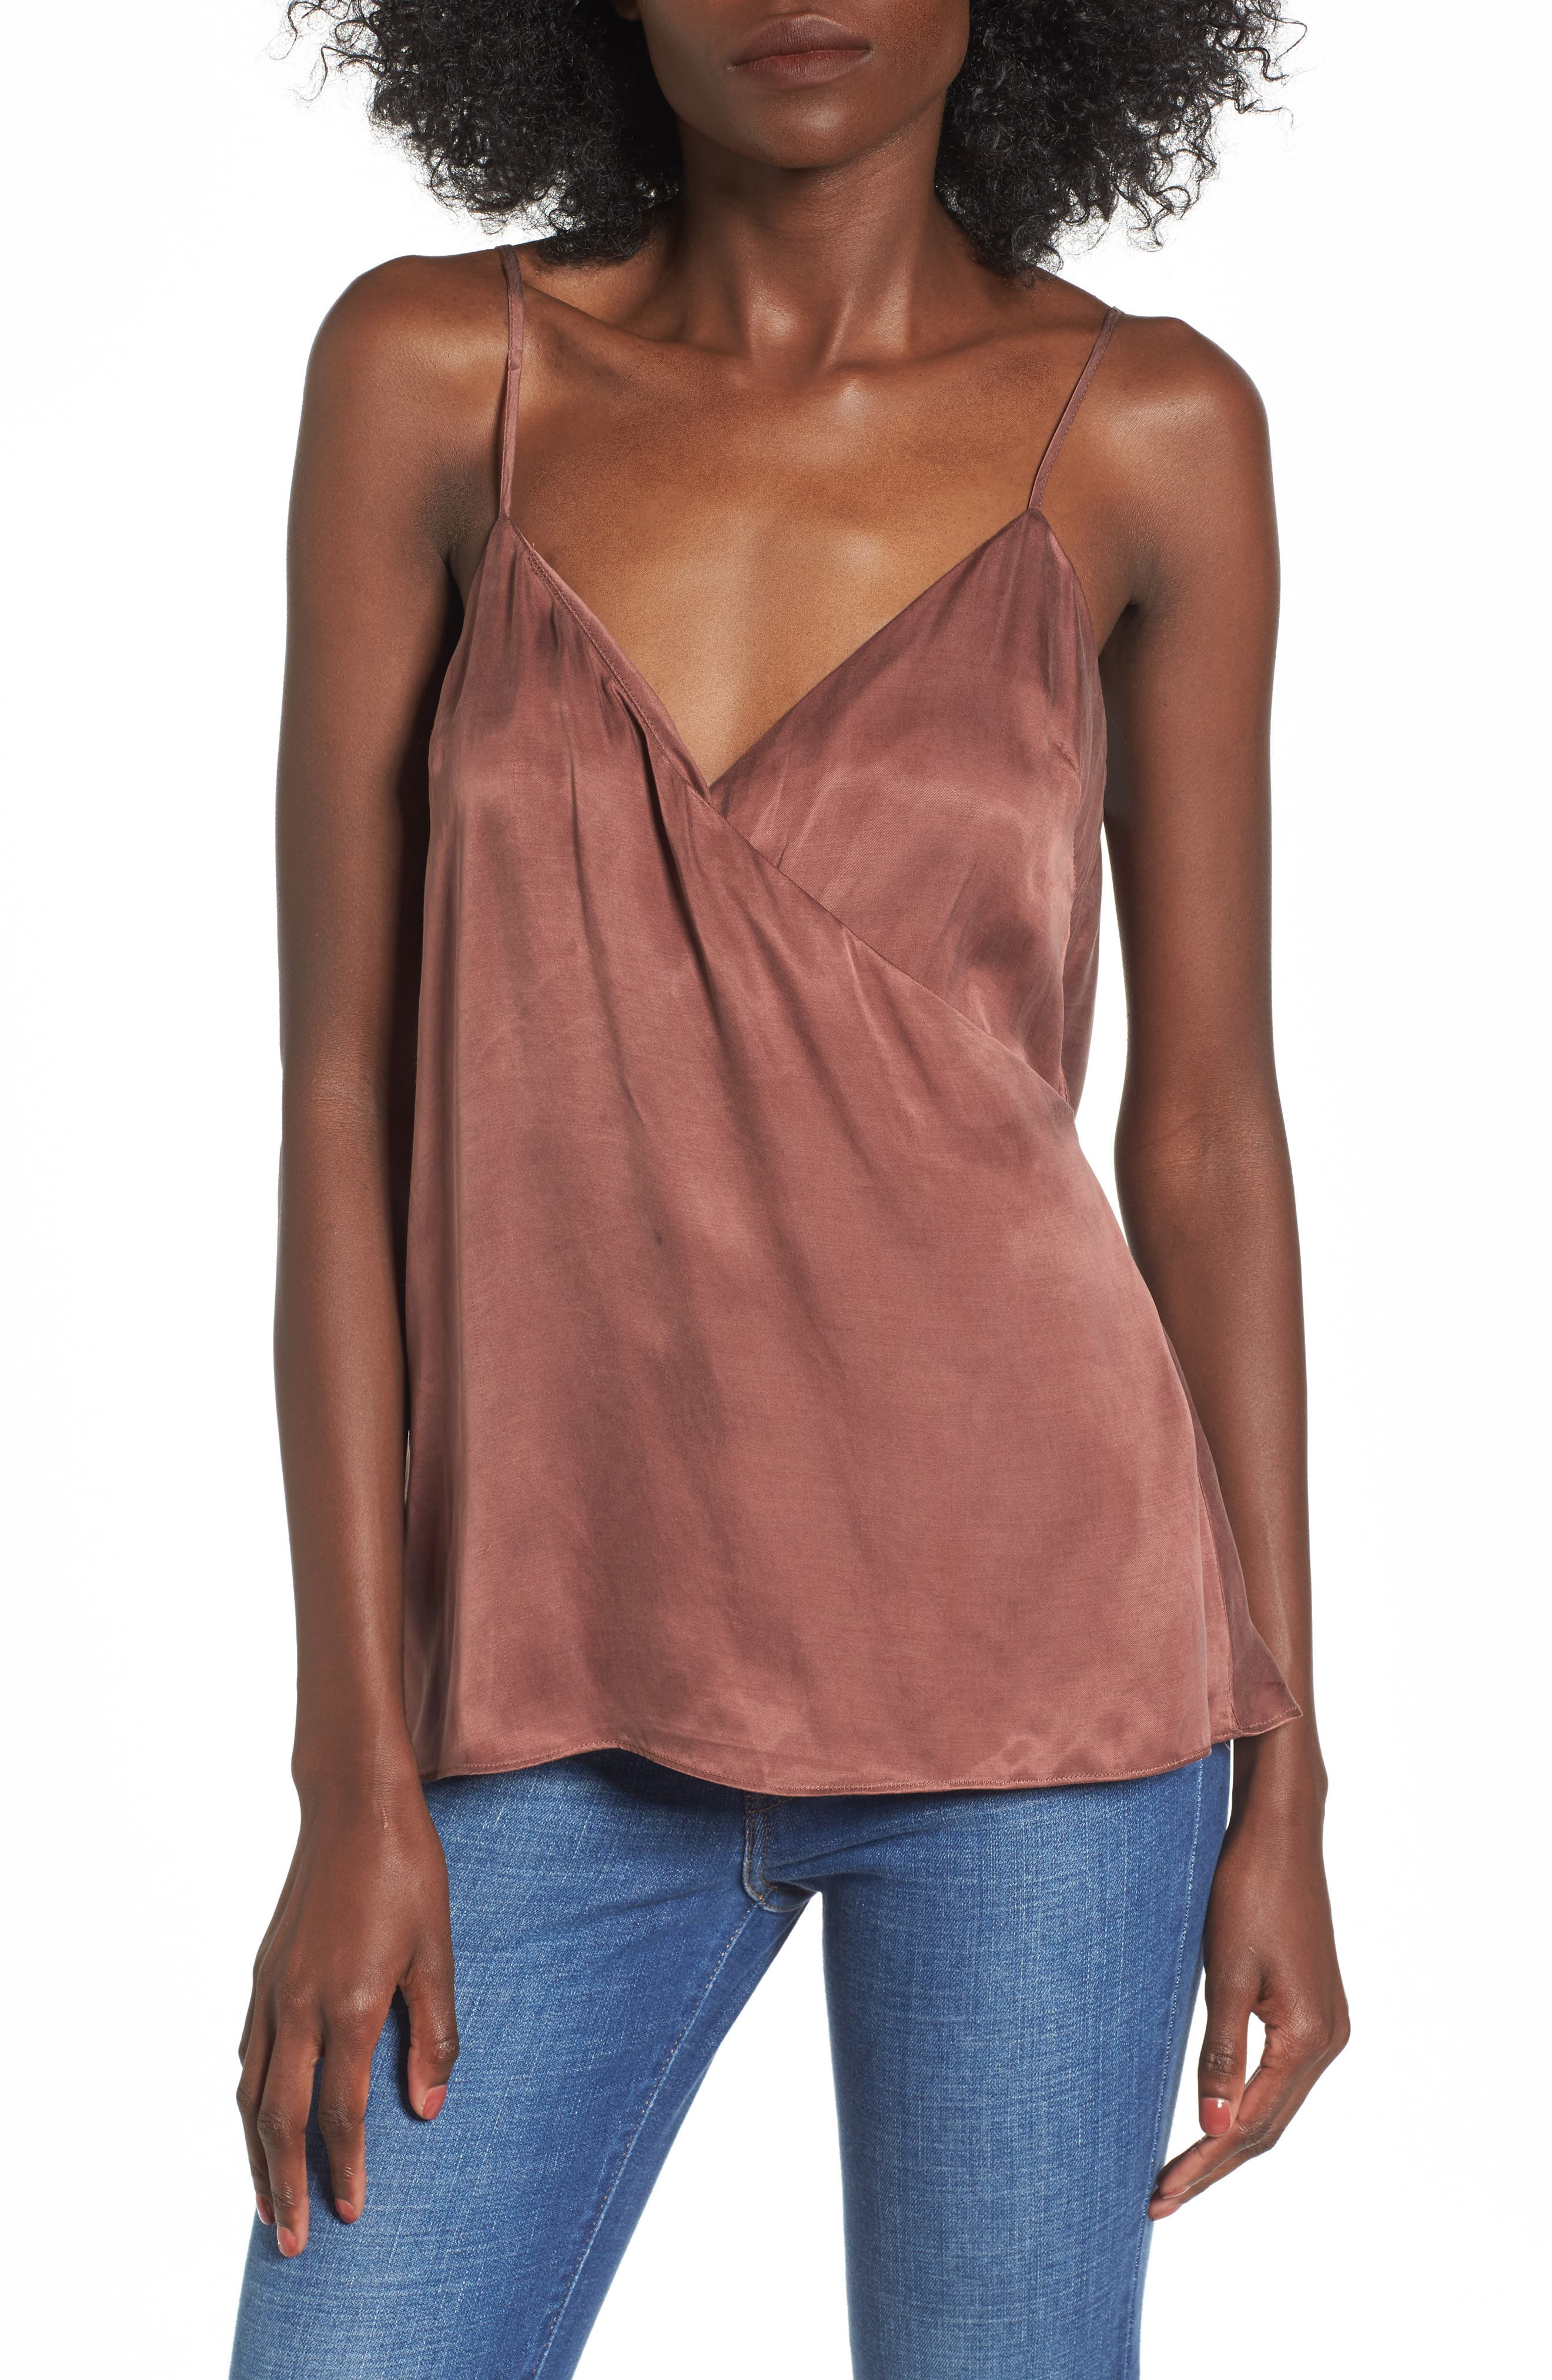 Alternate Image 1 Selected - NBD Monica Drape Back Camisole